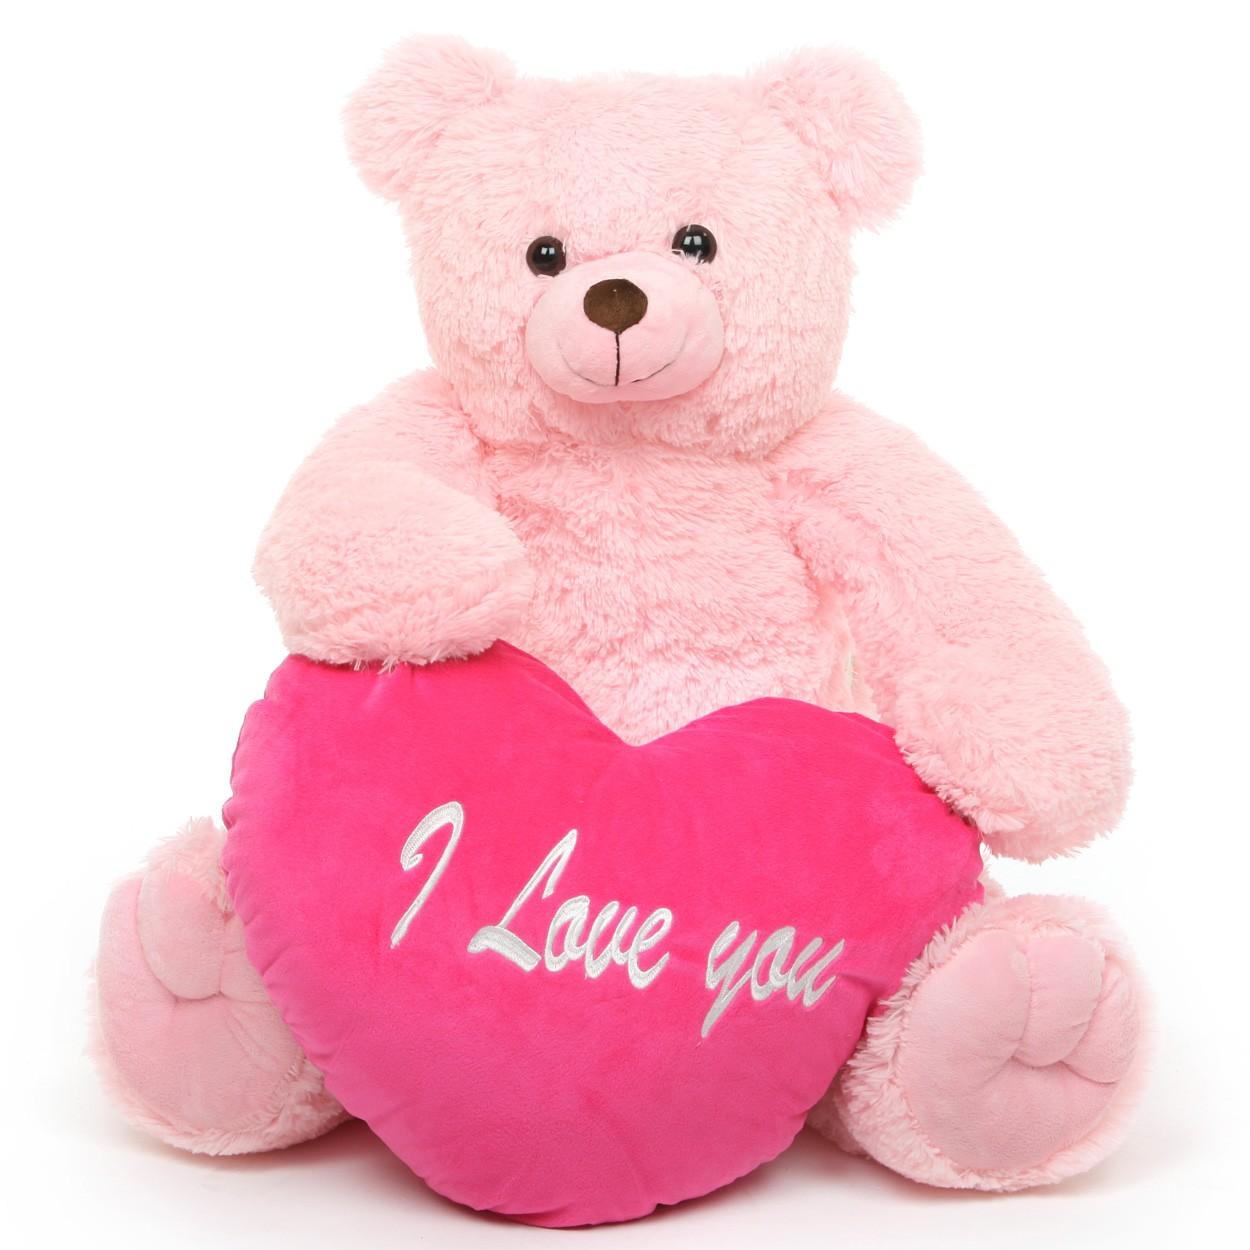 Pink cute teddy bear wallpapers - photo#15